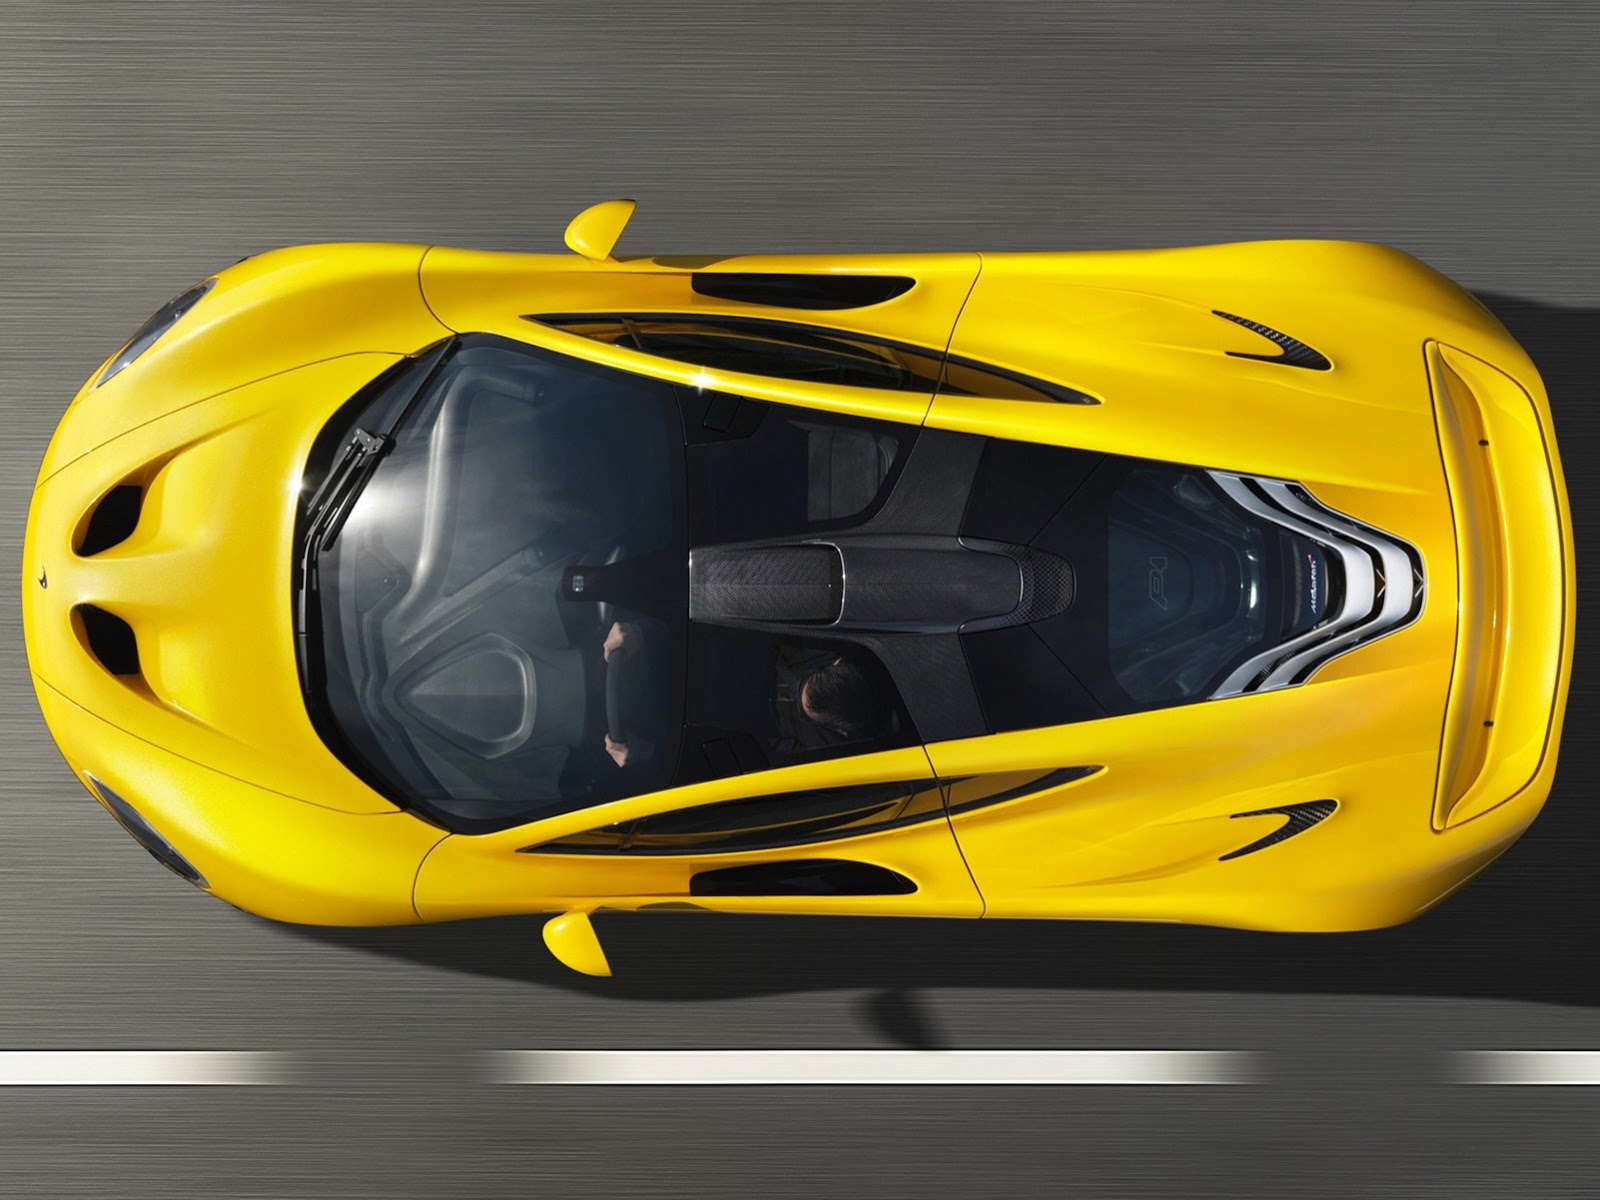 2014 McLaren P1 top picture